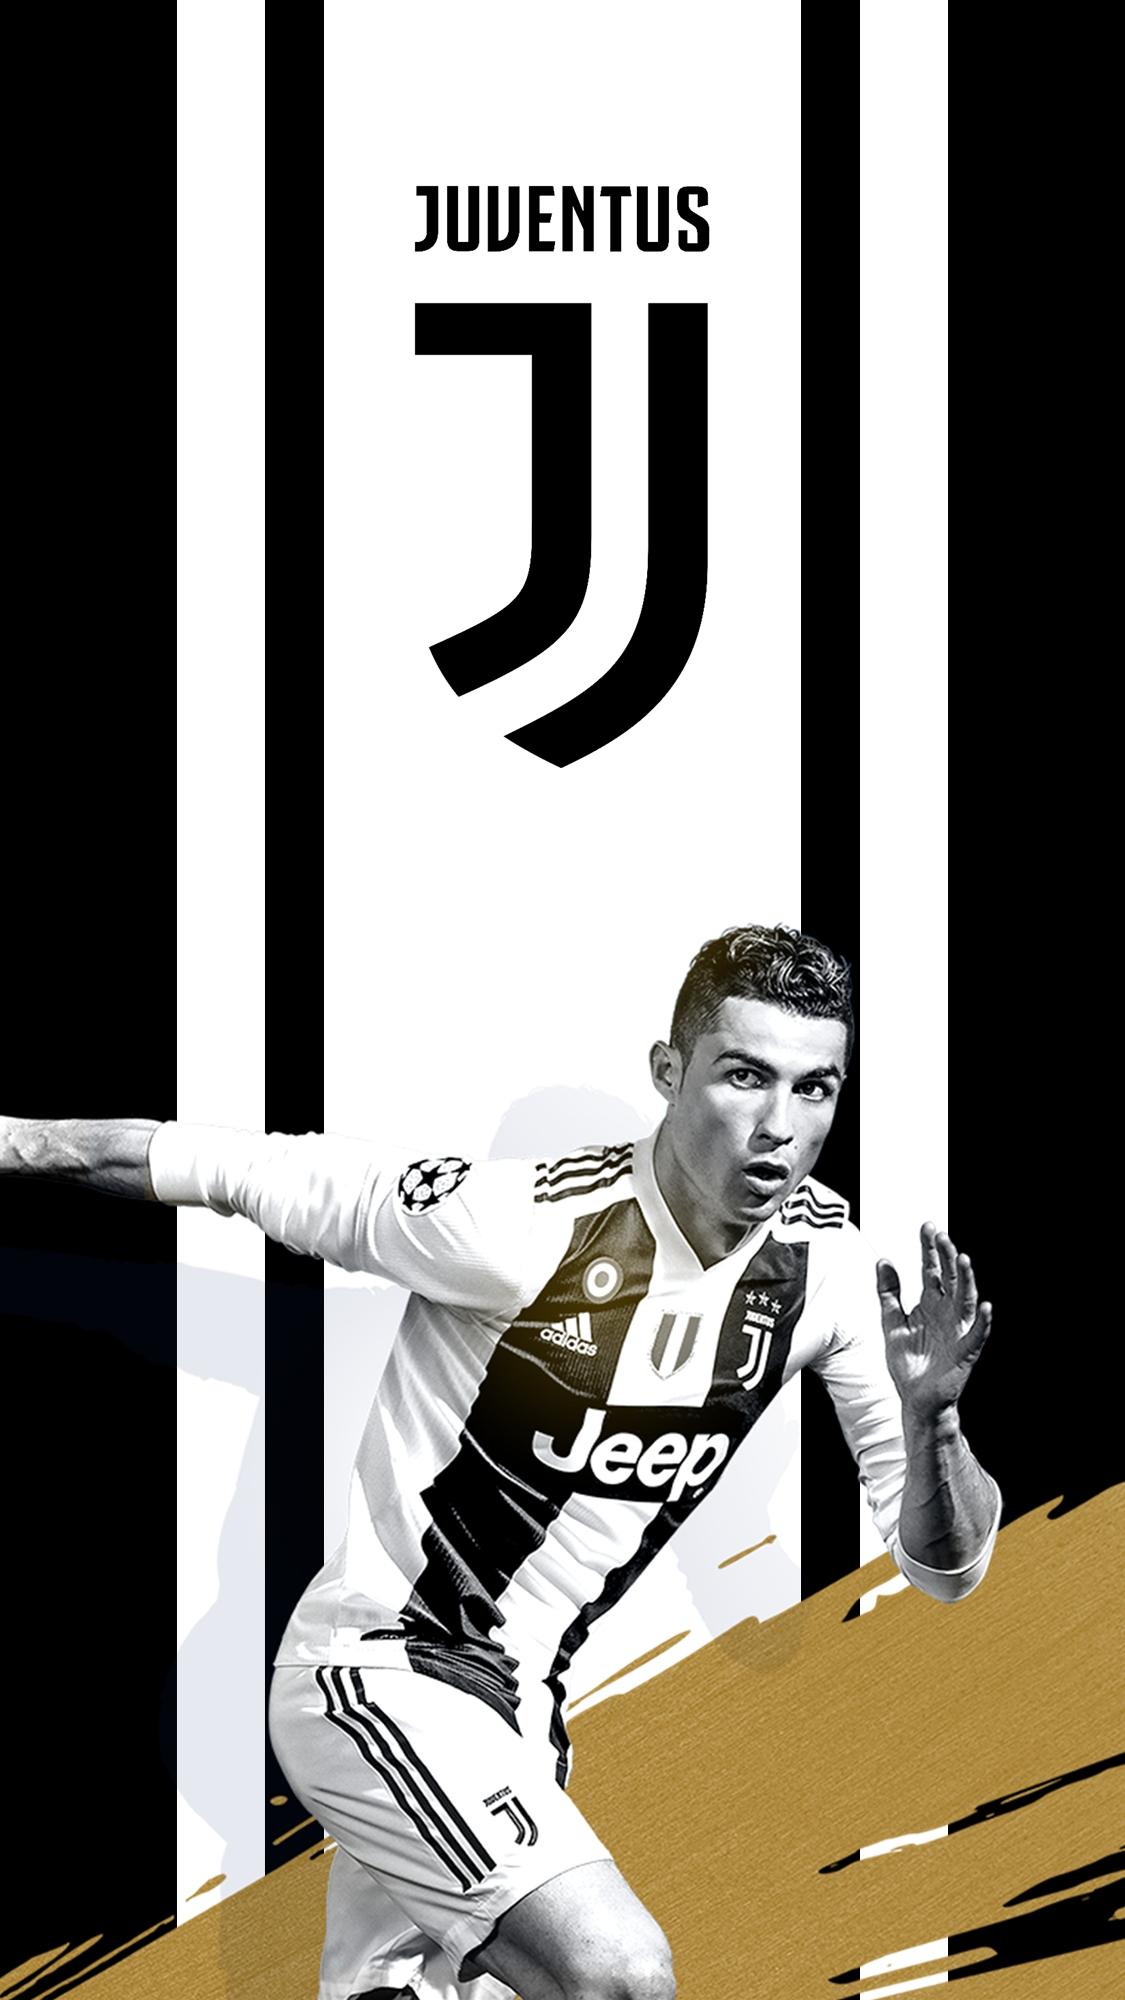 Cr7 Juventus Wallpaper Mobile By Hokage455 On Deviantart